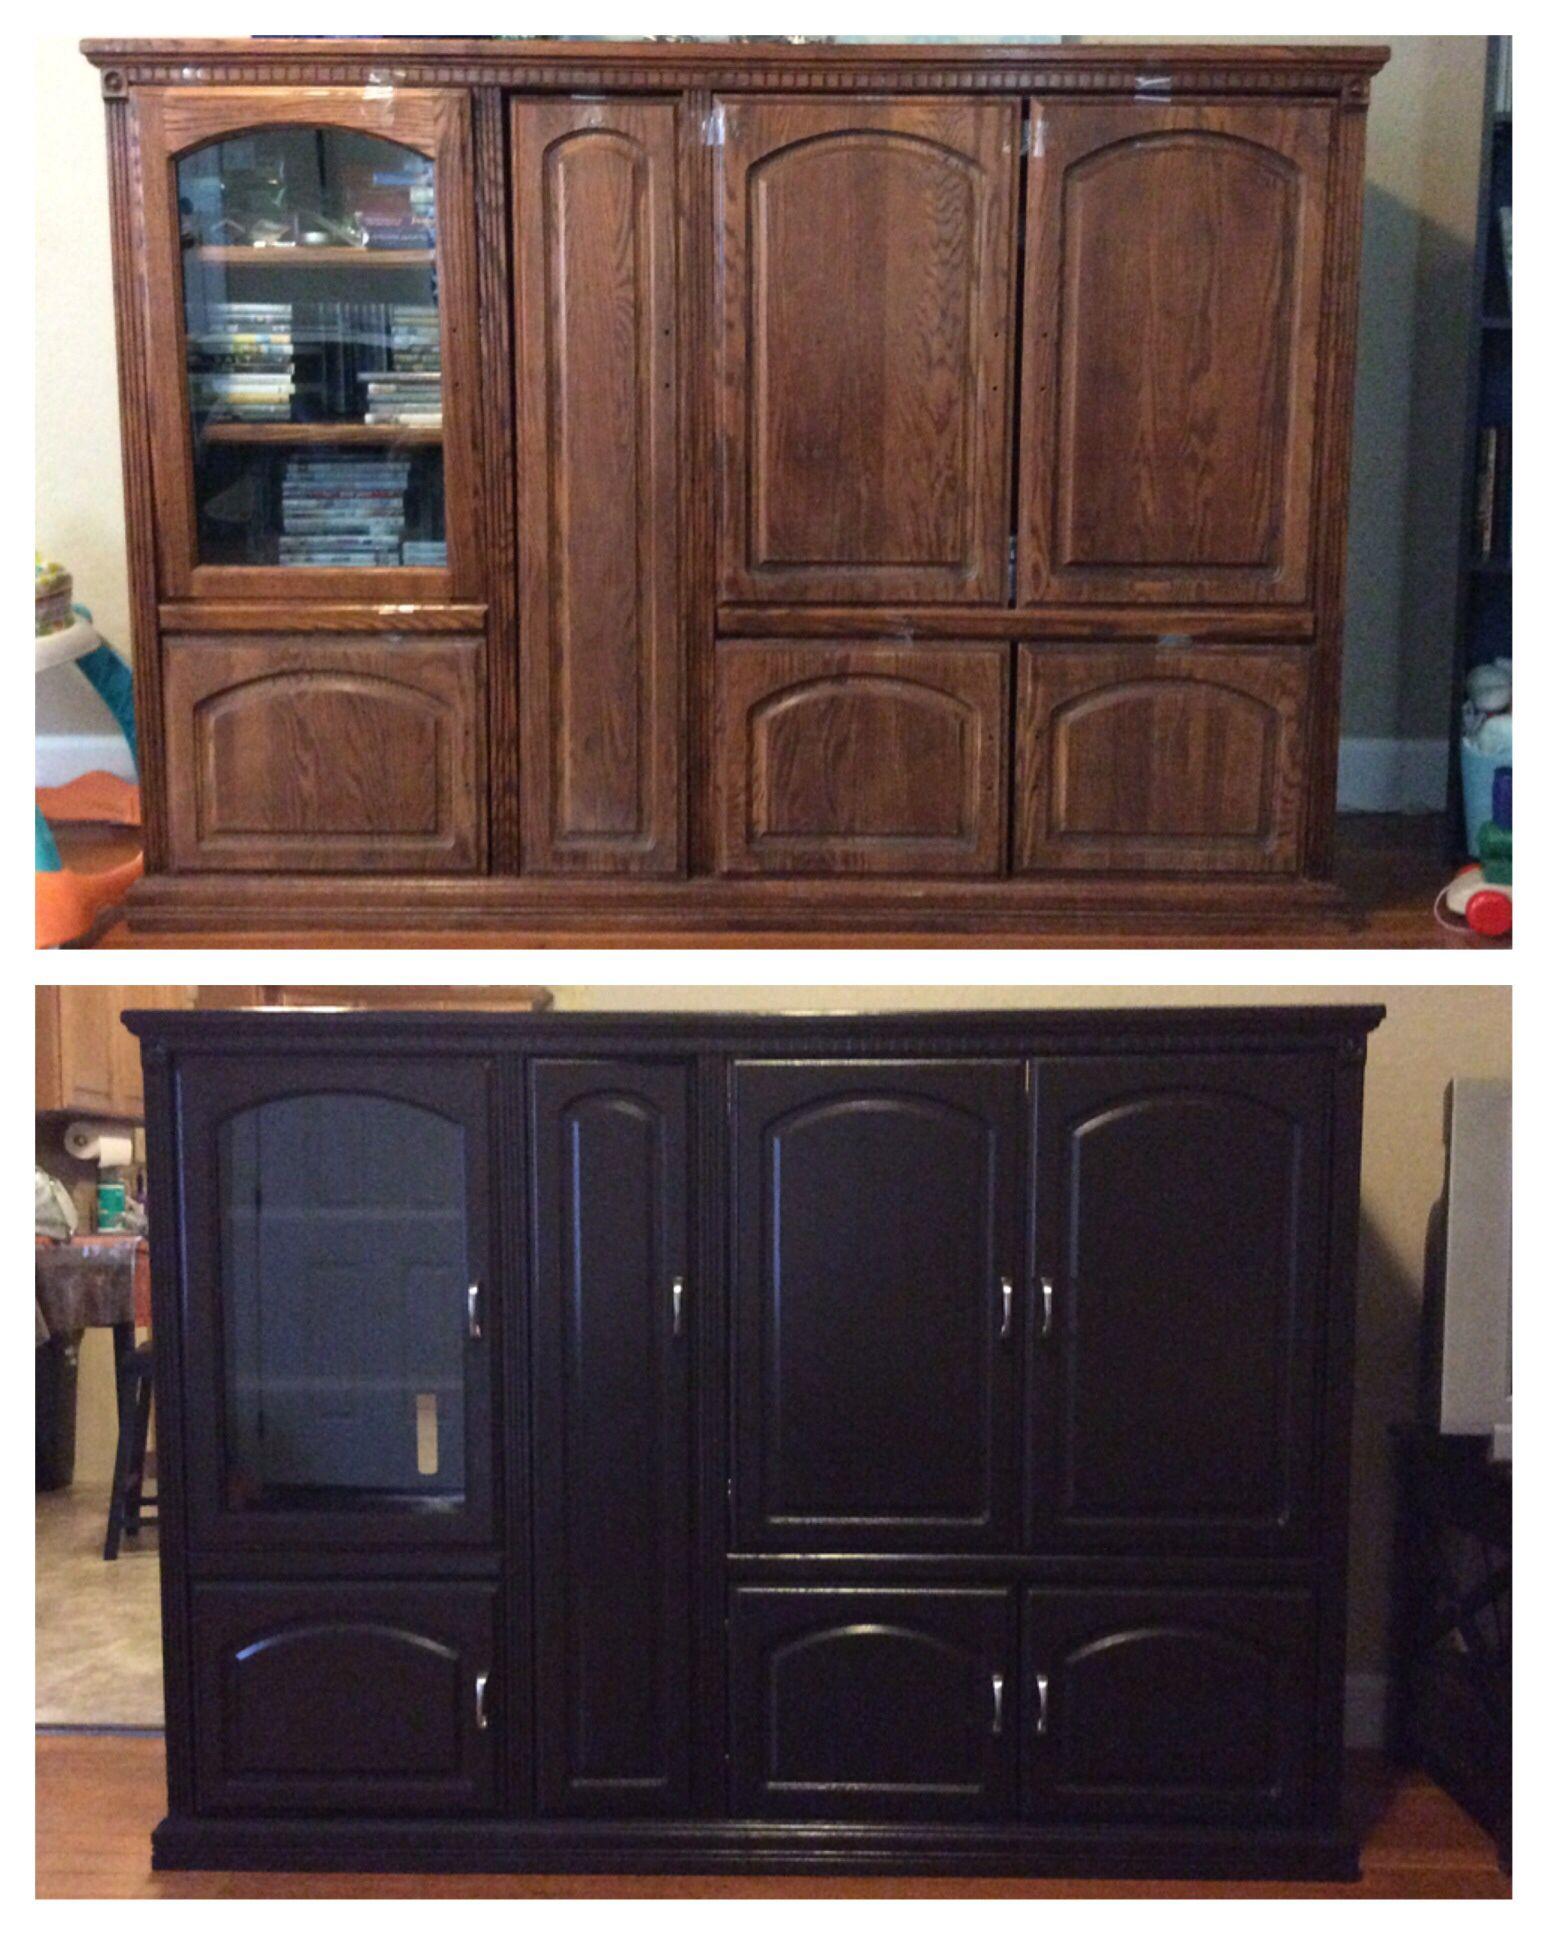 Craigslist Tampa Kitchen Cabinets For Sale - Iwn Kitchen